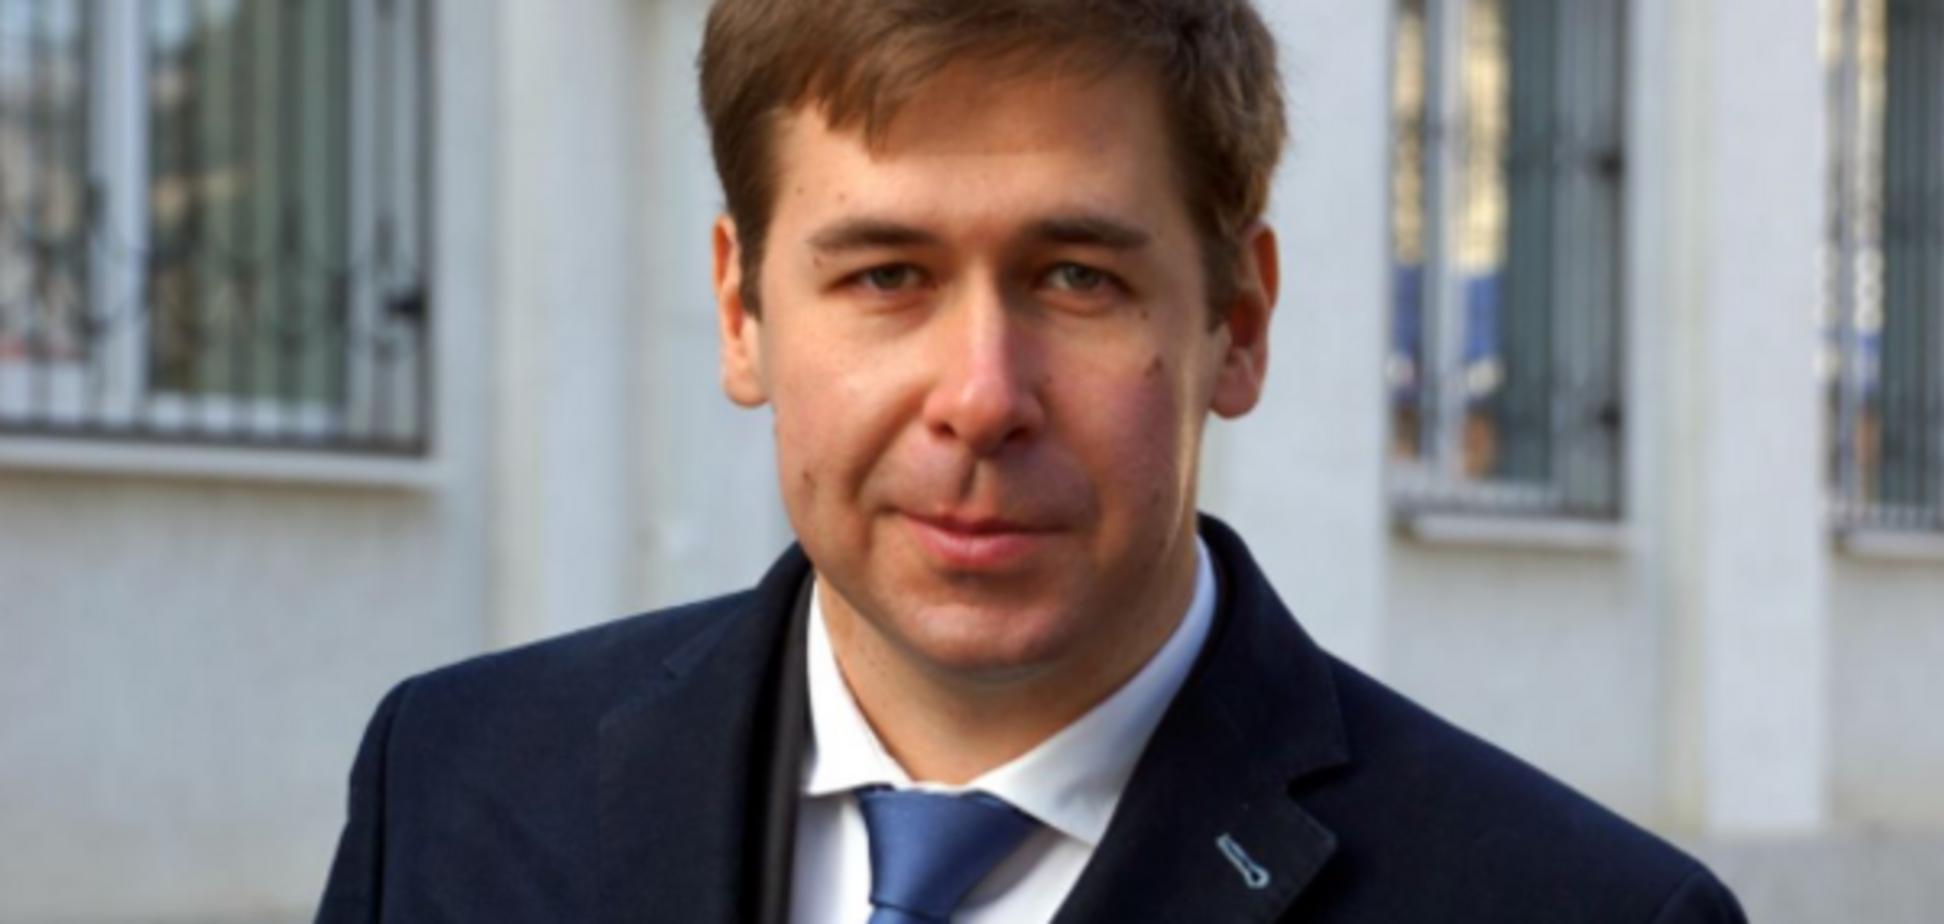 Ілля Новіков